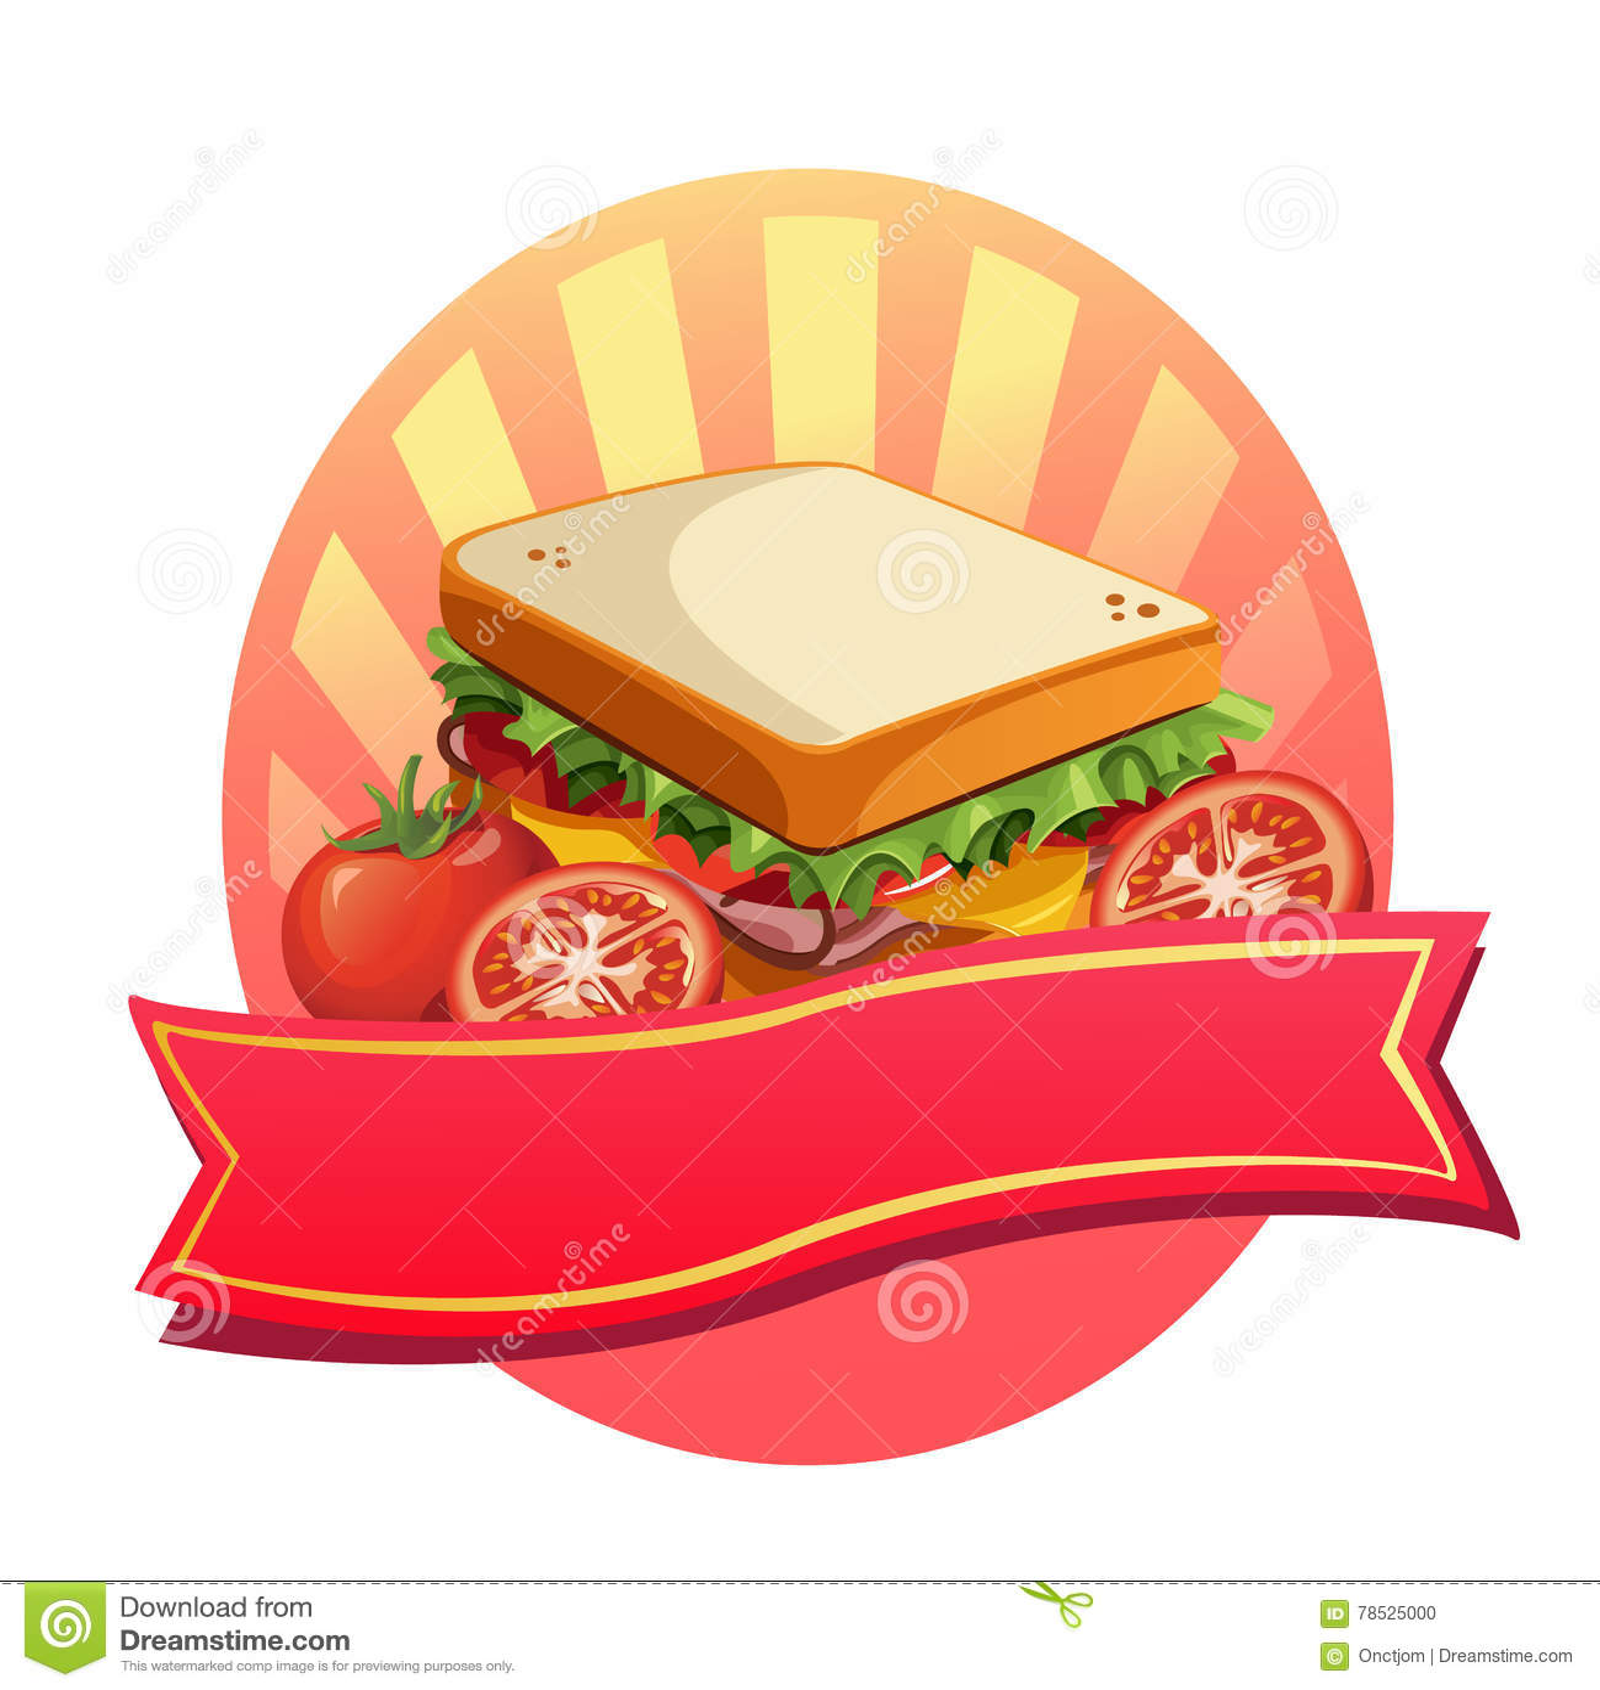 sandwich label stock vector illustration of background 78525000